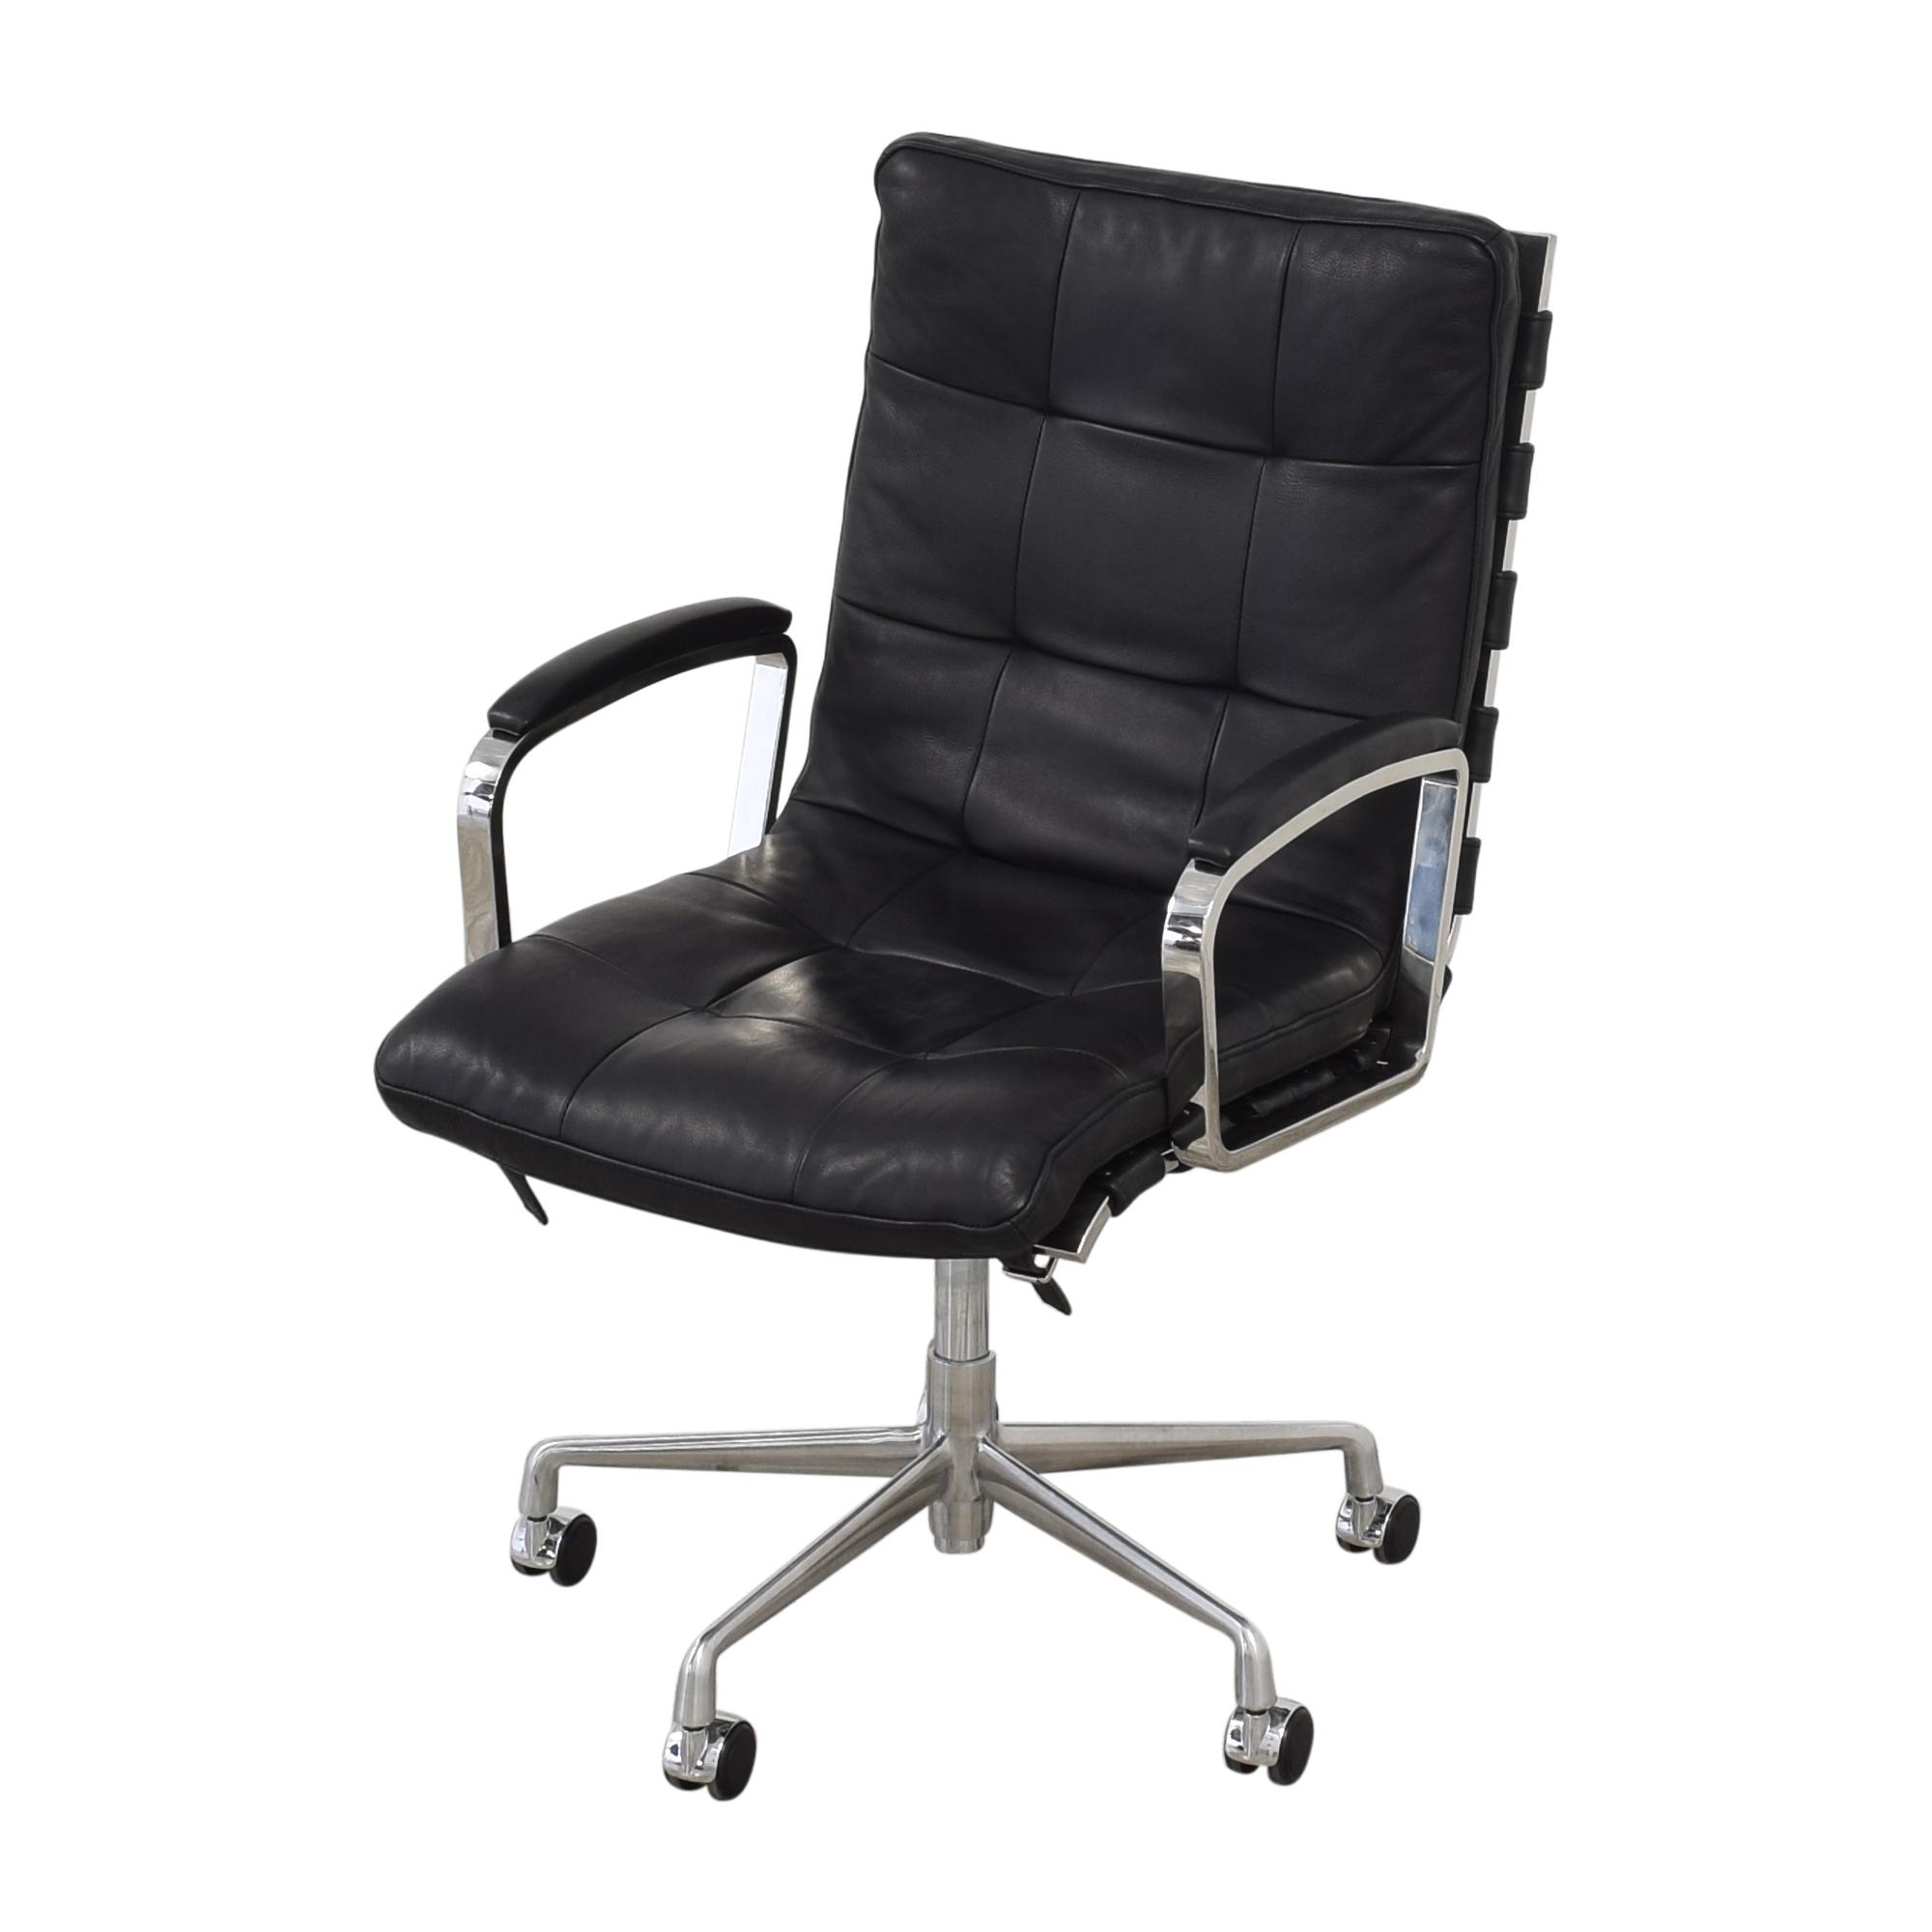 Restoration Hardware Restoration Hardware Rossi Desk Chair dimensions